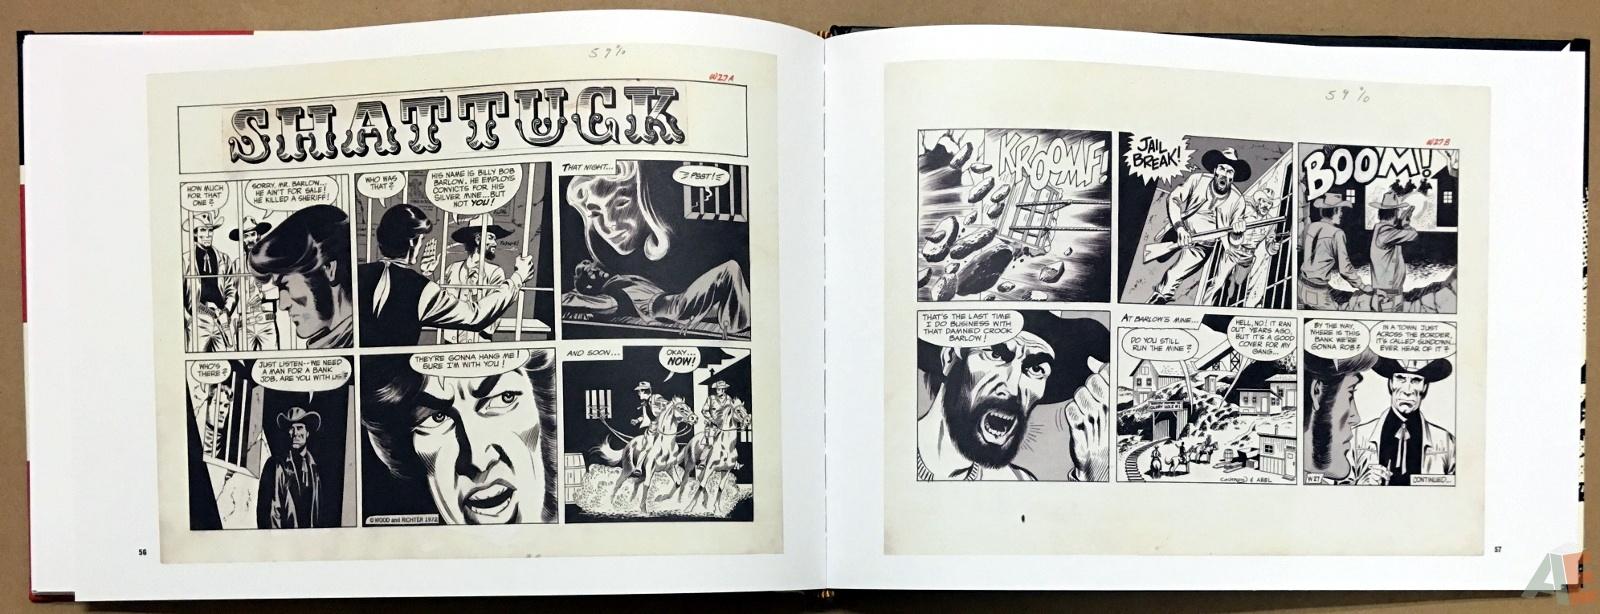 Wallace Wood Presents Shattuck Original Art Edition 20